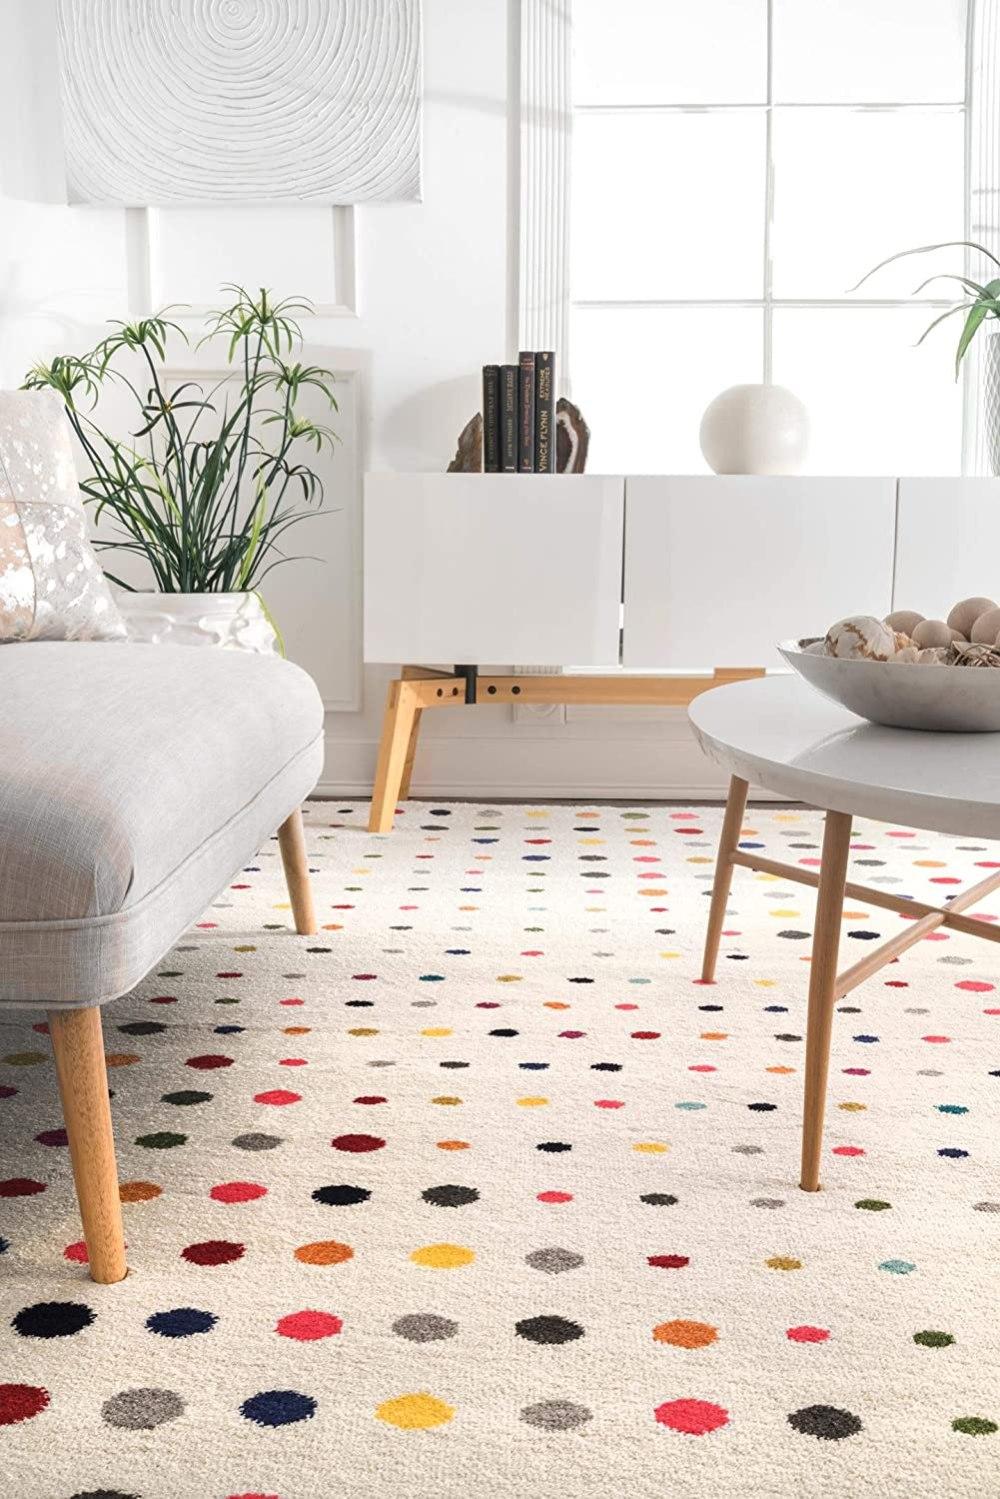 nuLOOM Dorie Dots Area Rug, 5' x 8', Multi